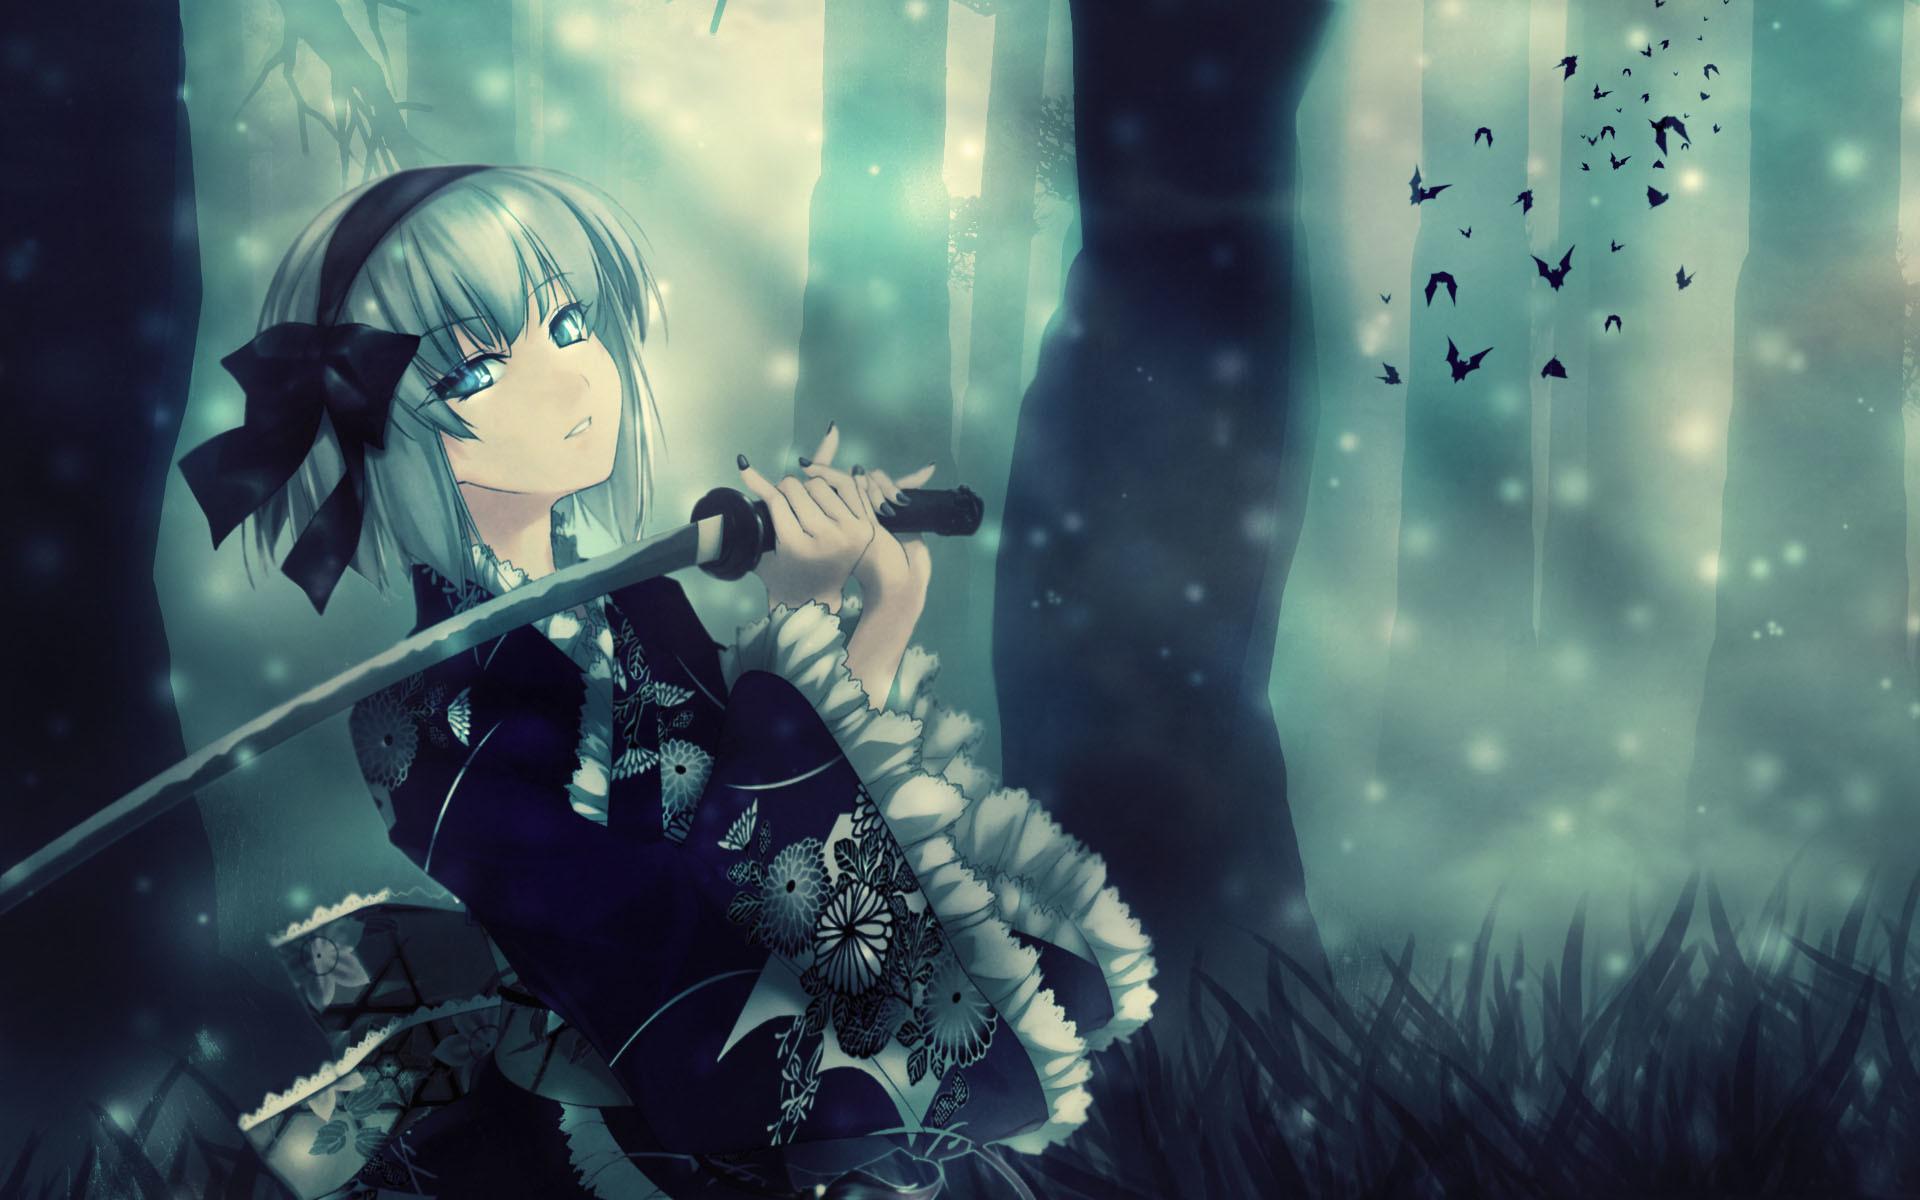 Pandora Hearts HD Wallpapers Backgrounds Wallpaper   HD Wallpapers    Pinterest   Wallpaper, Manga anime and Manga